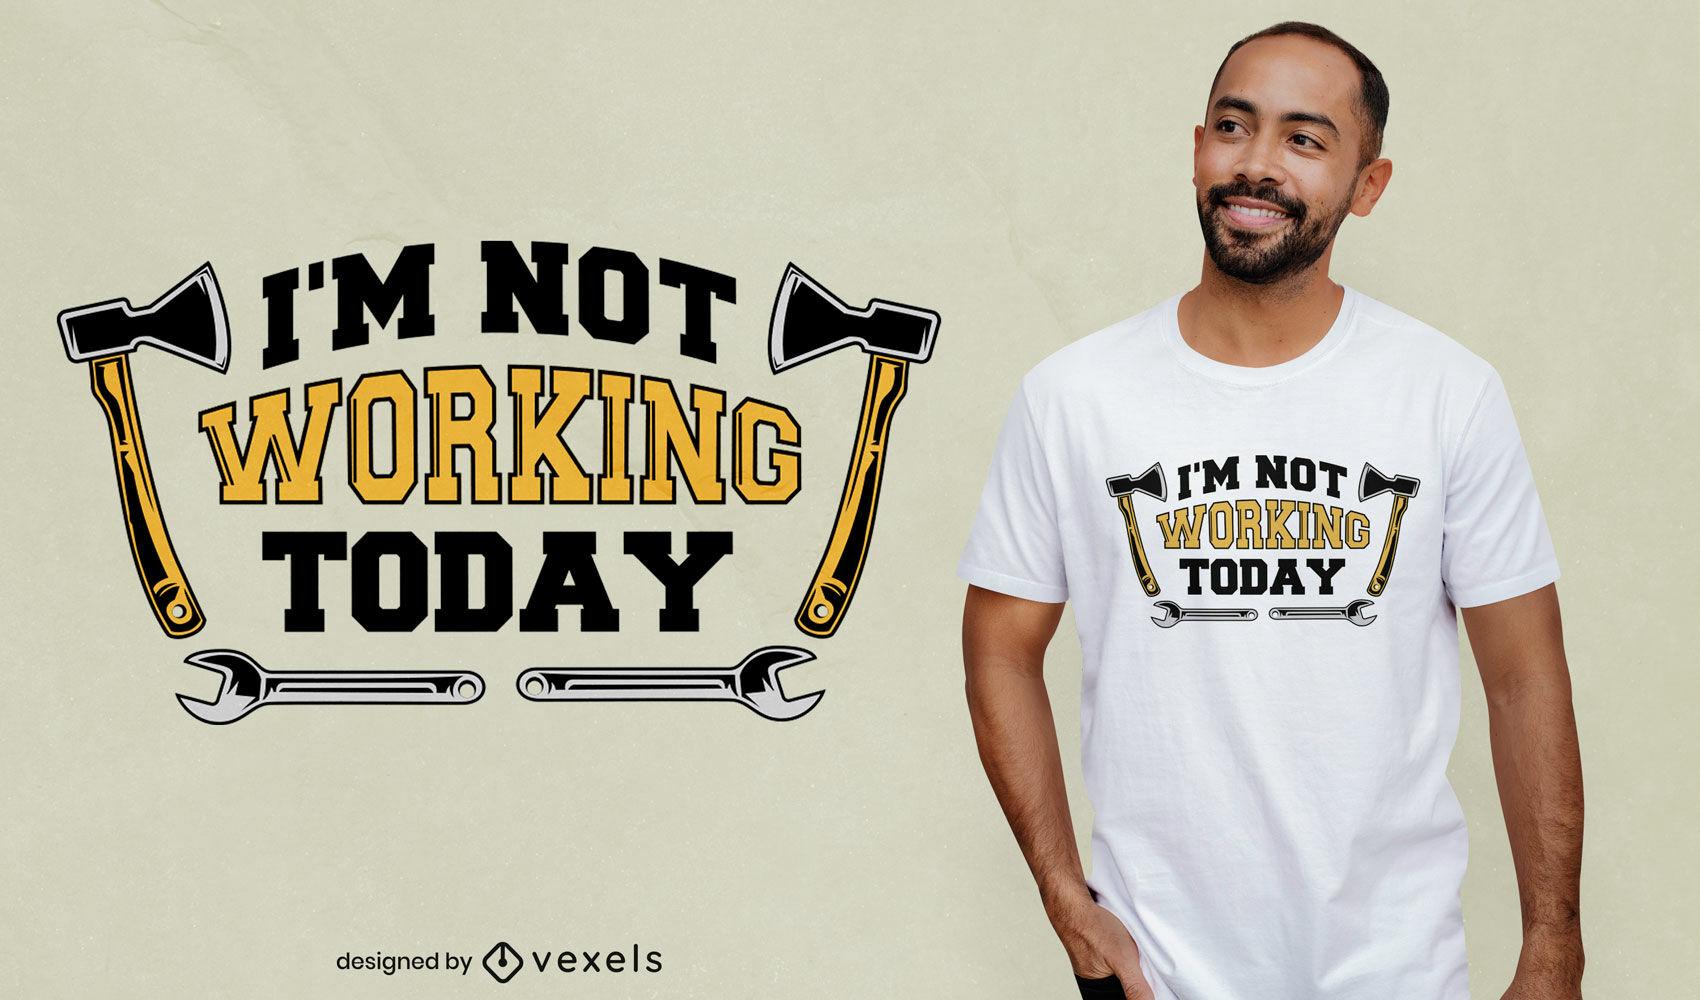 No funciona hoy dise?o de camiseta de herramientas.